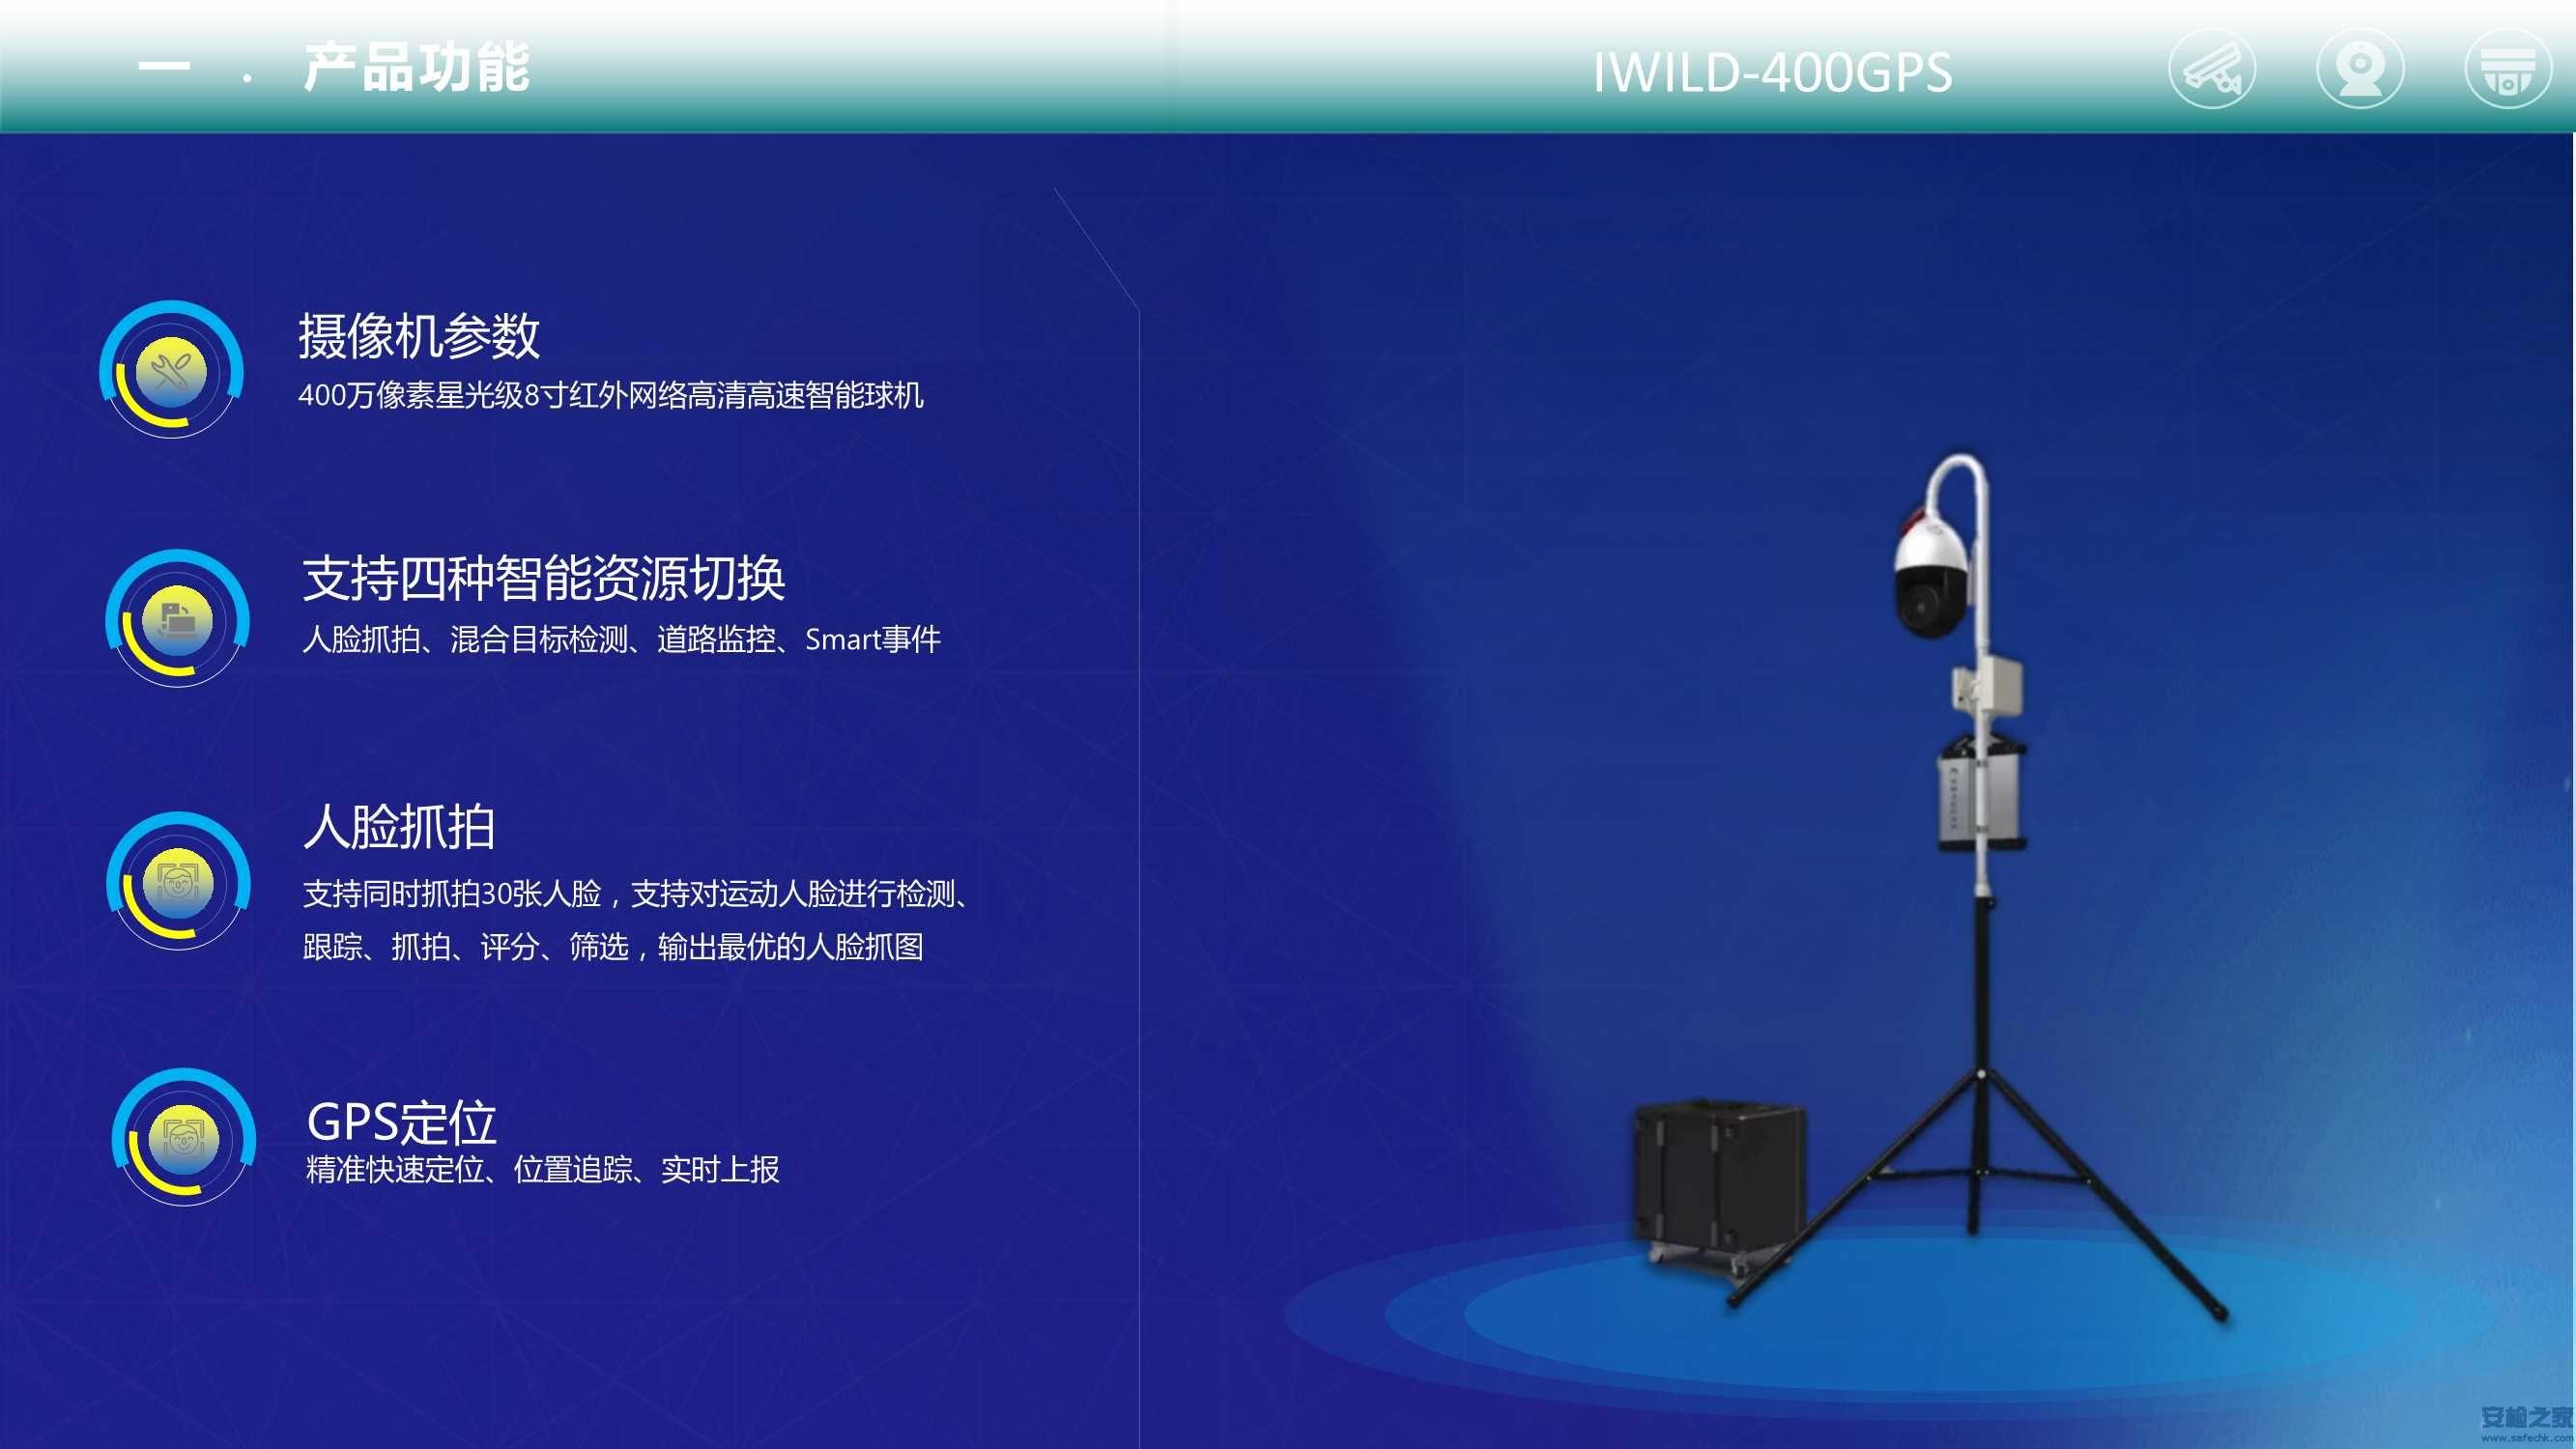 IWILD-400GPS便携式监控布防系统